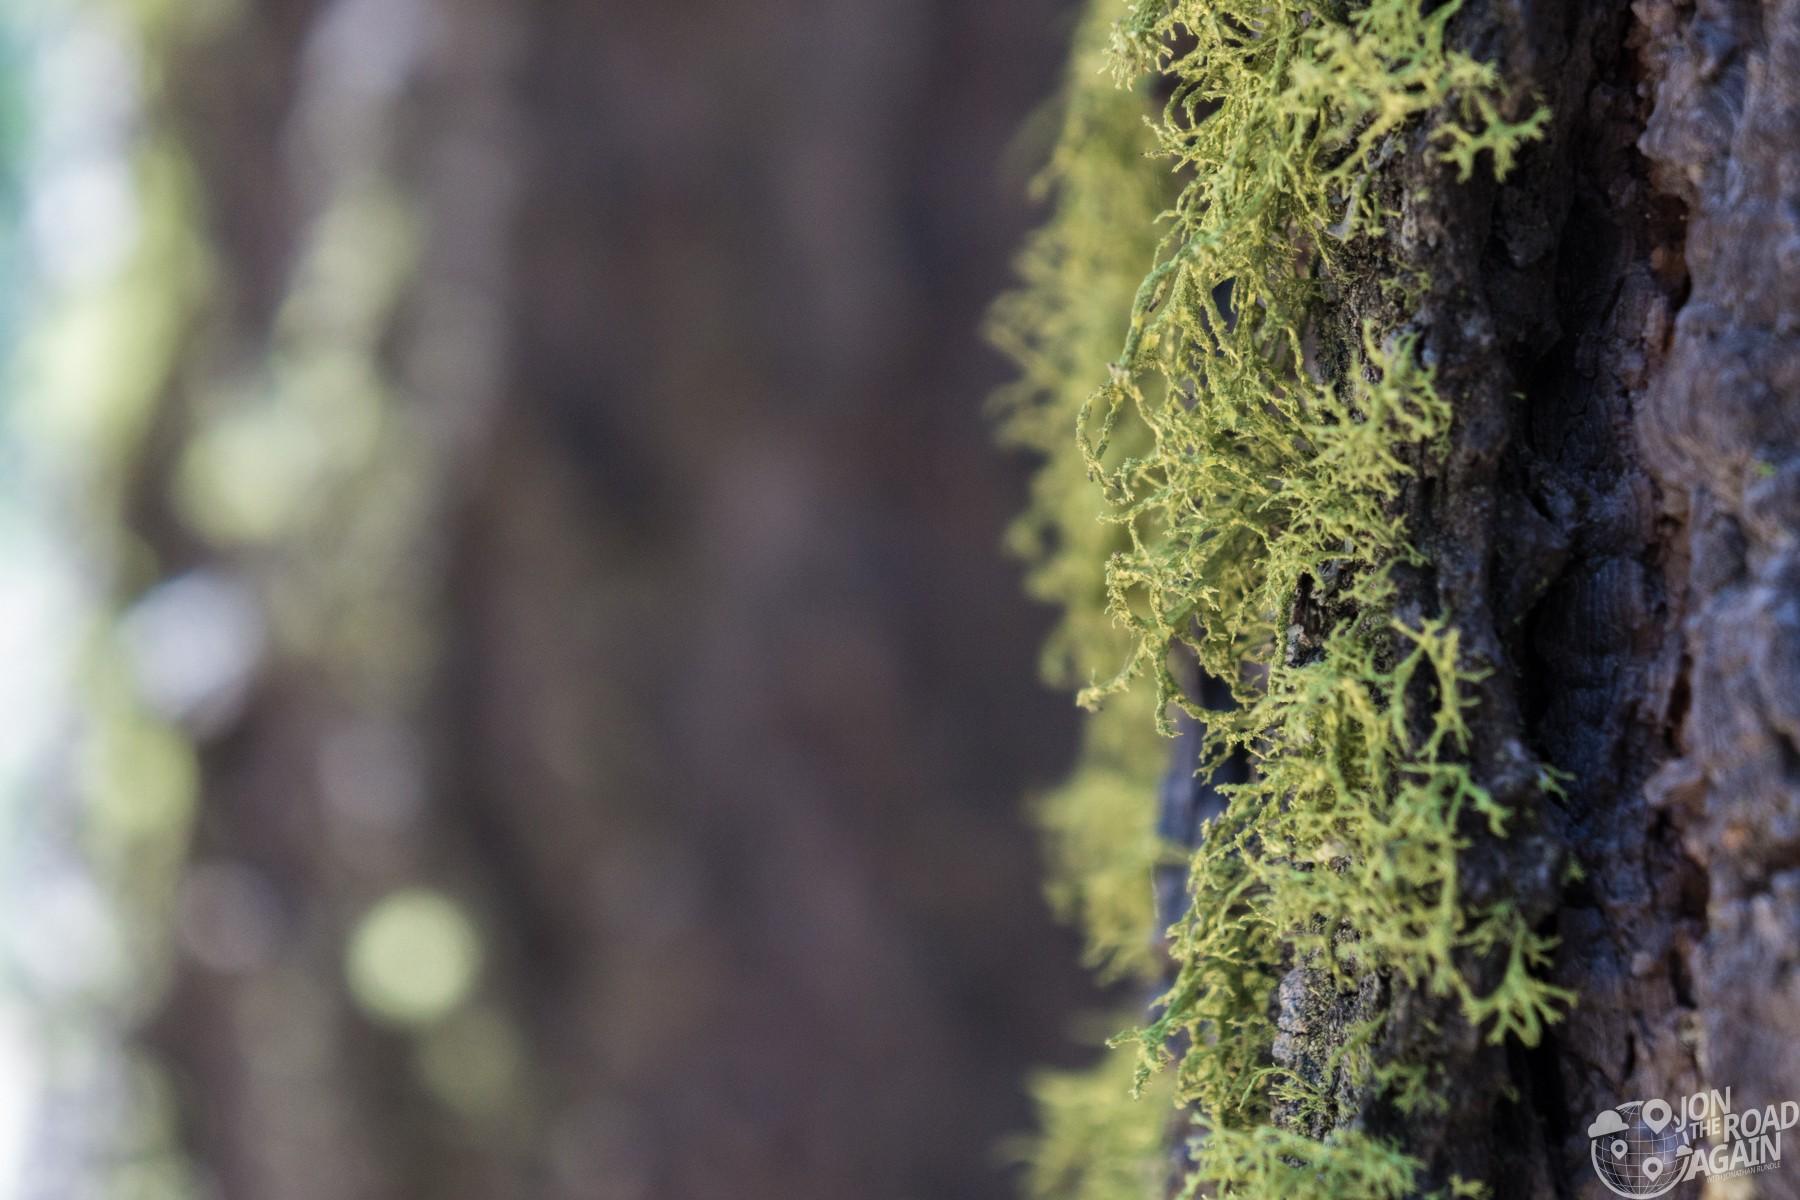 Mariposa Grove Moss